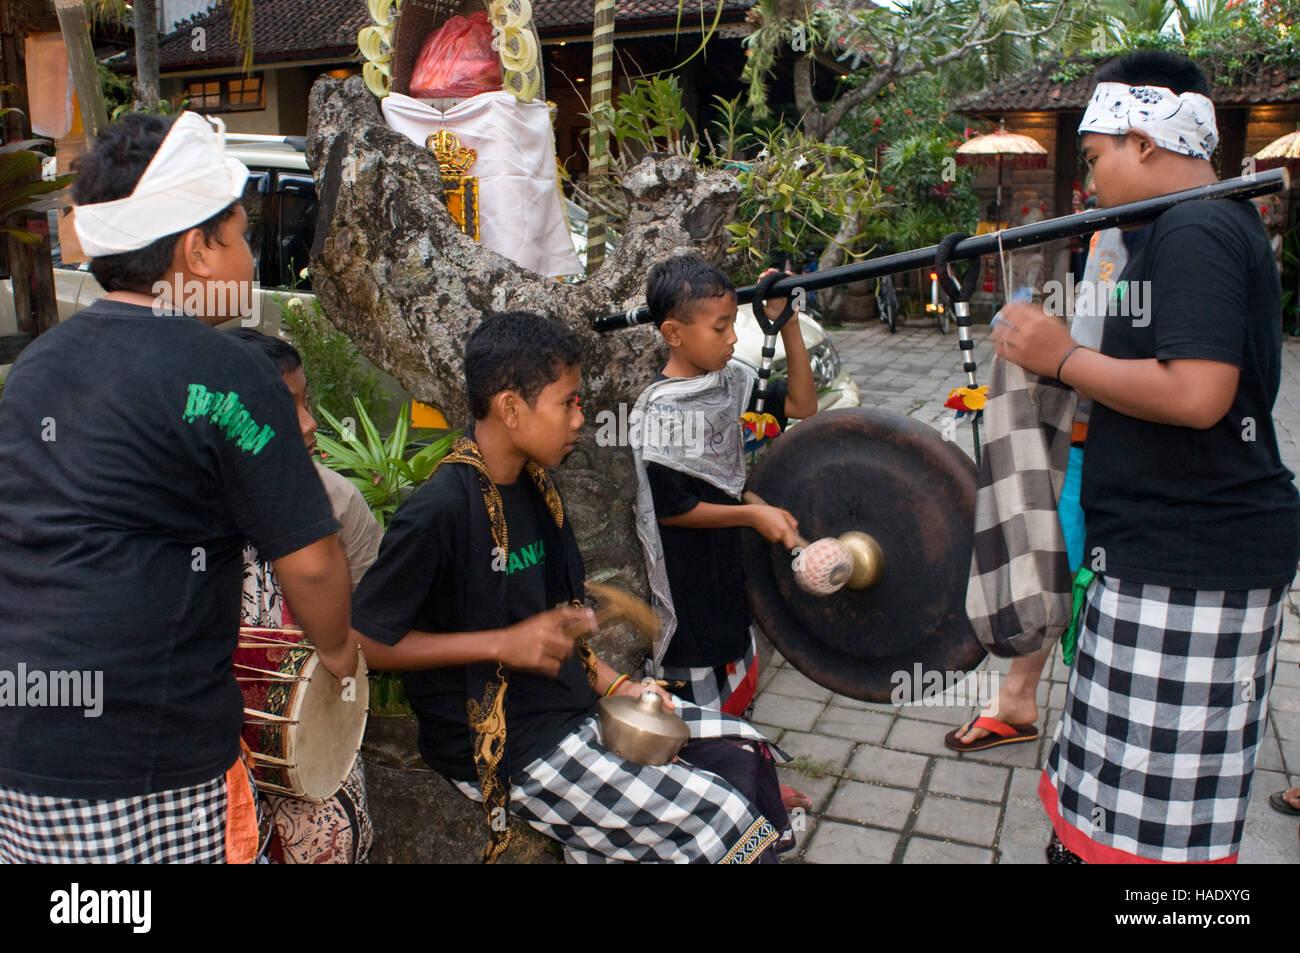 Galungan. Ubud Monkey forest. Ubud. Sacred Monkey Forest of Padangtegal. Several young people play music through - Stock Image